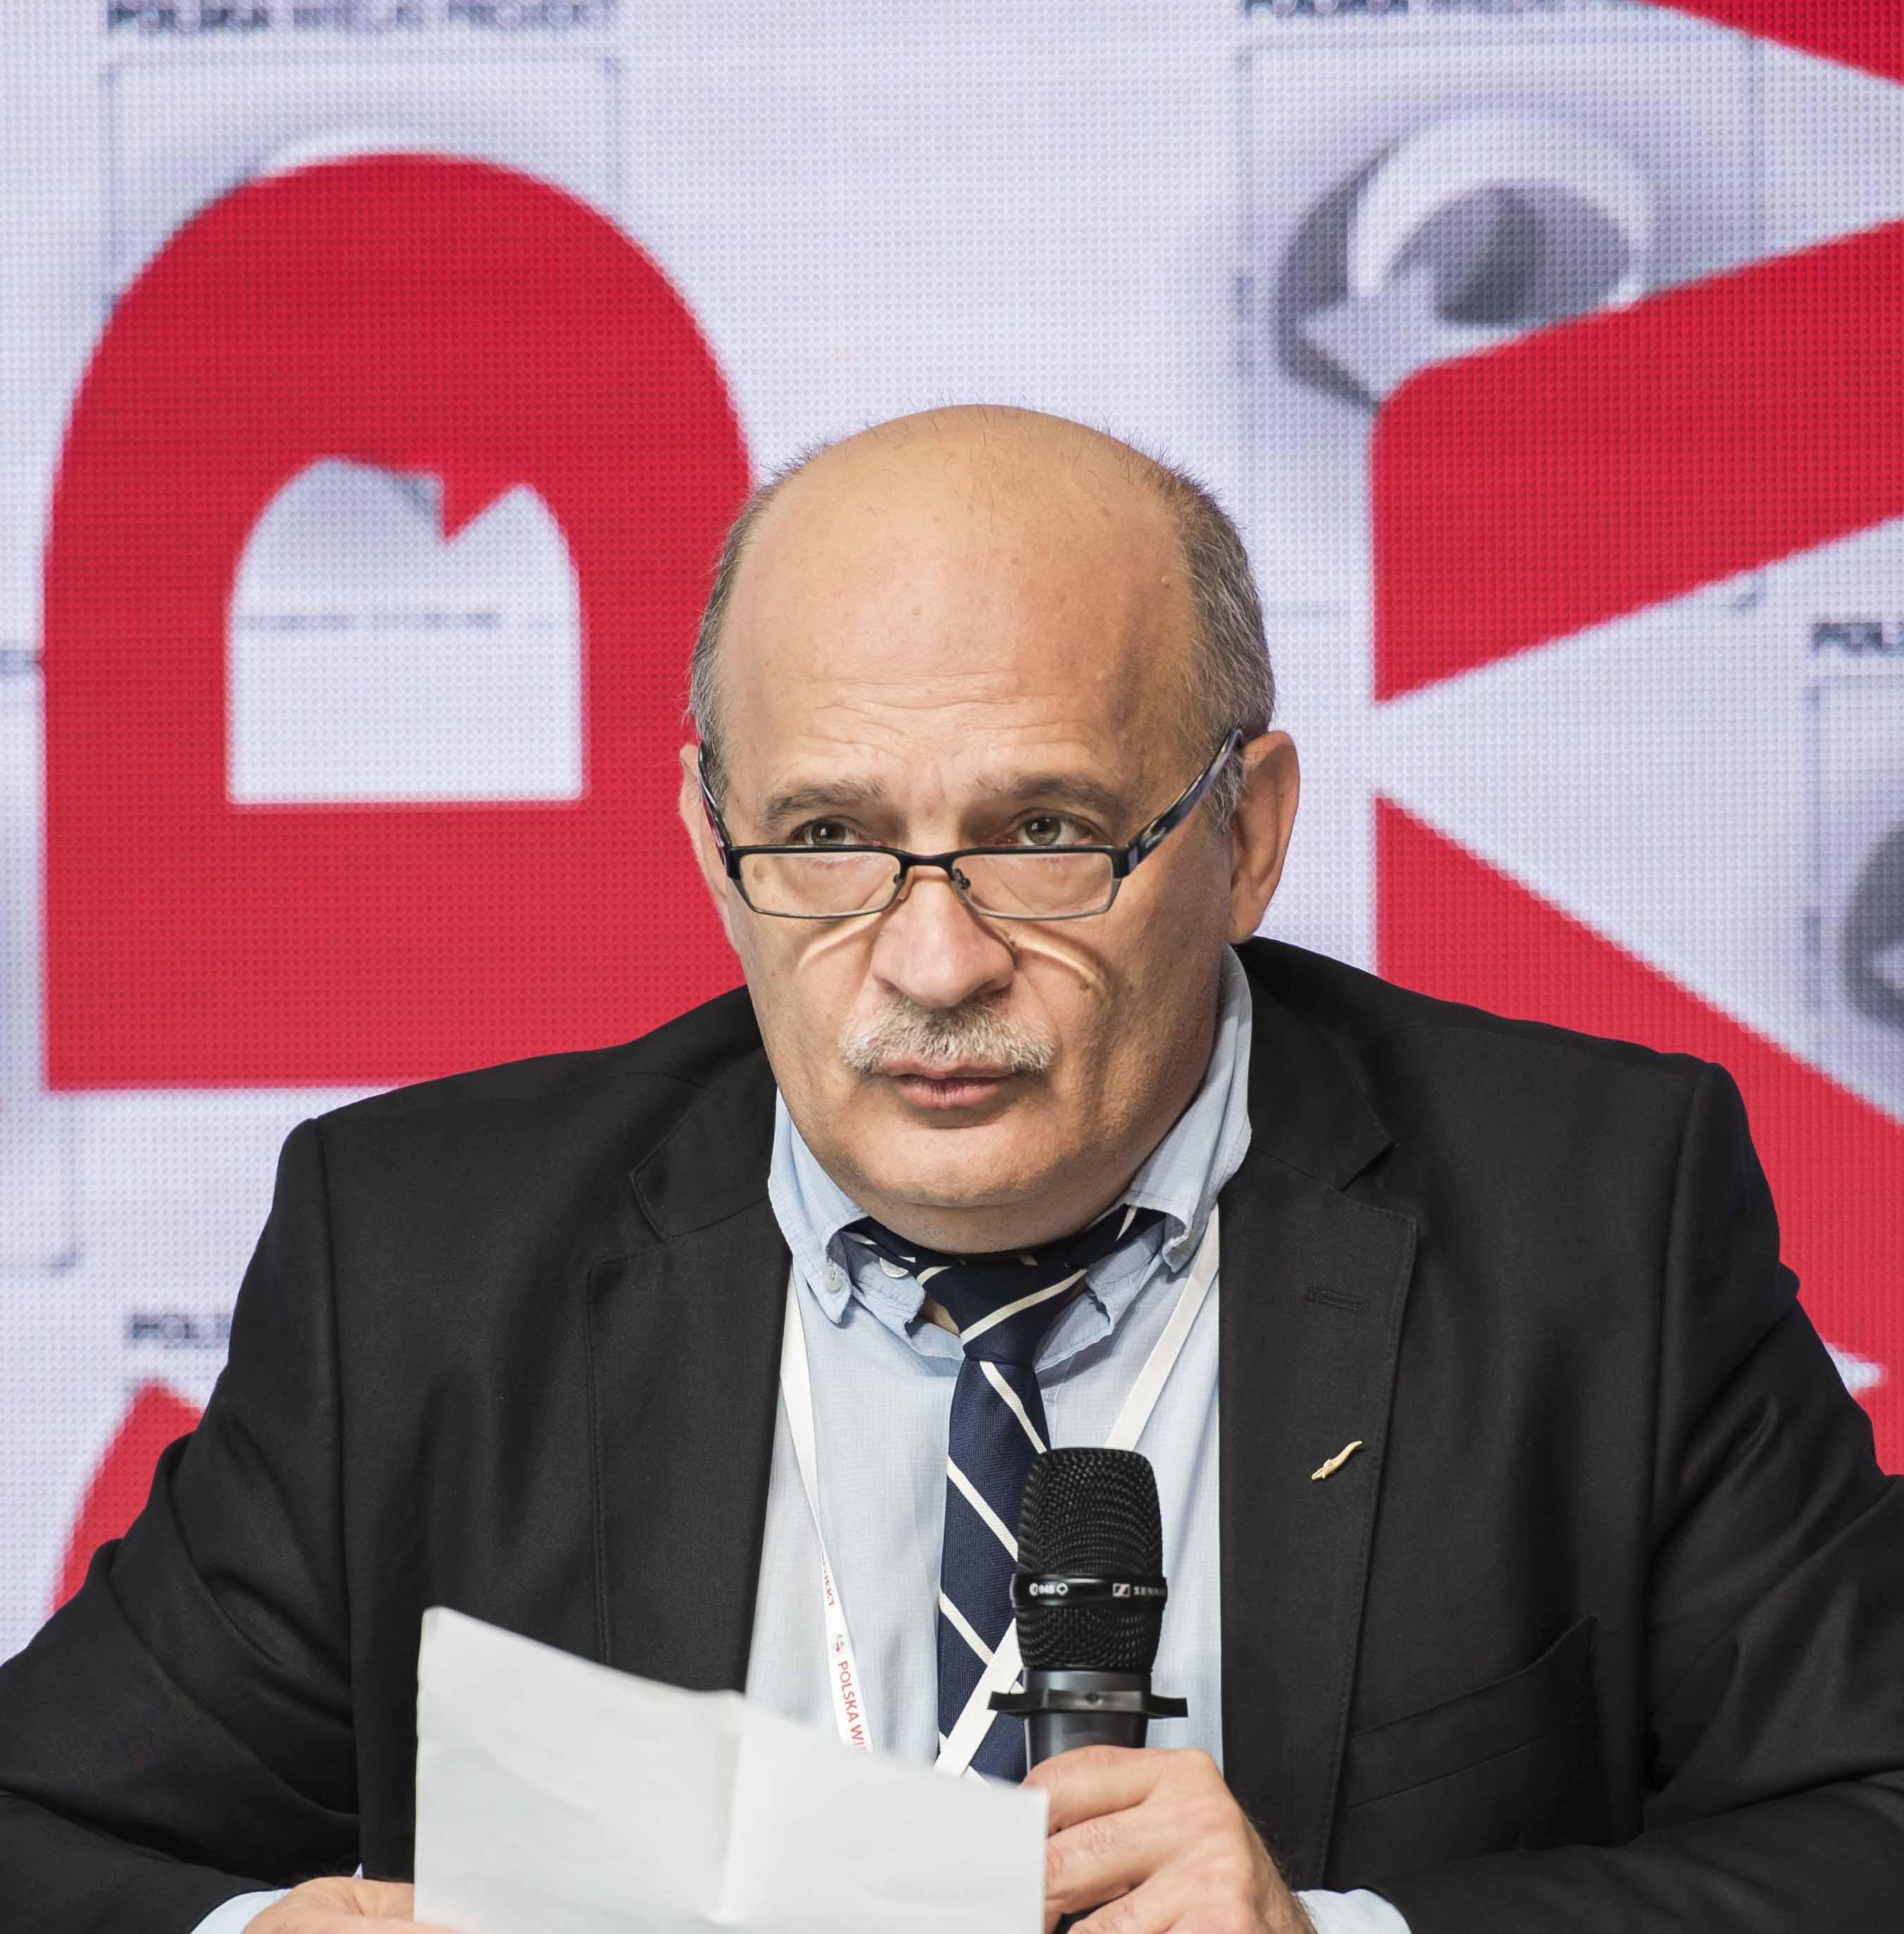 Florin Kubinschi